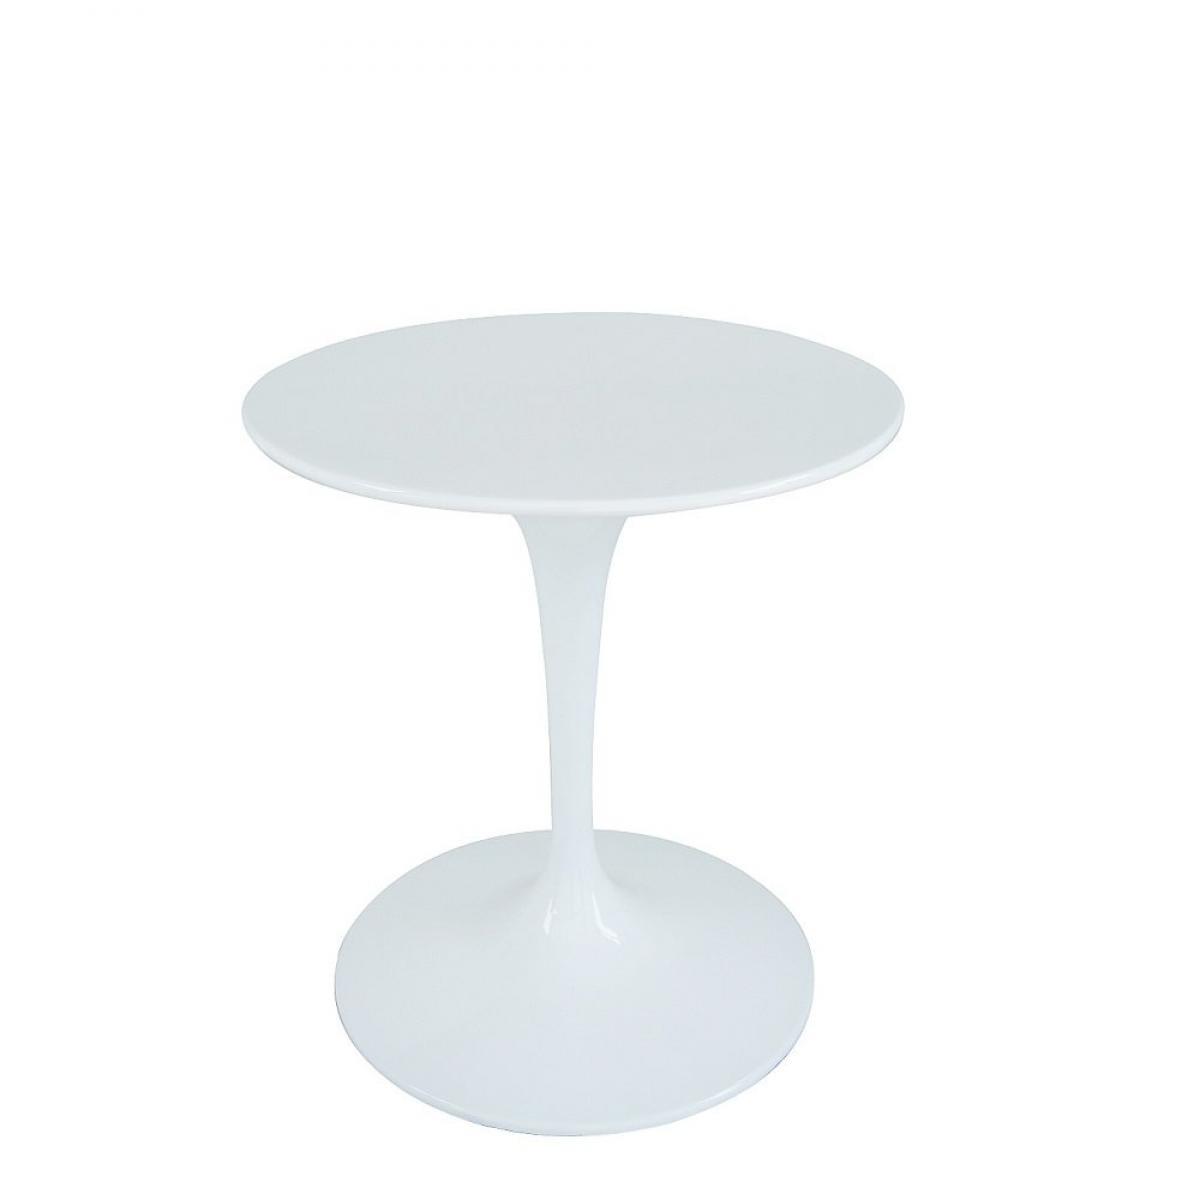 Inside 75 Table ronde de repas design TULIPE laquée blanc 60 cm.